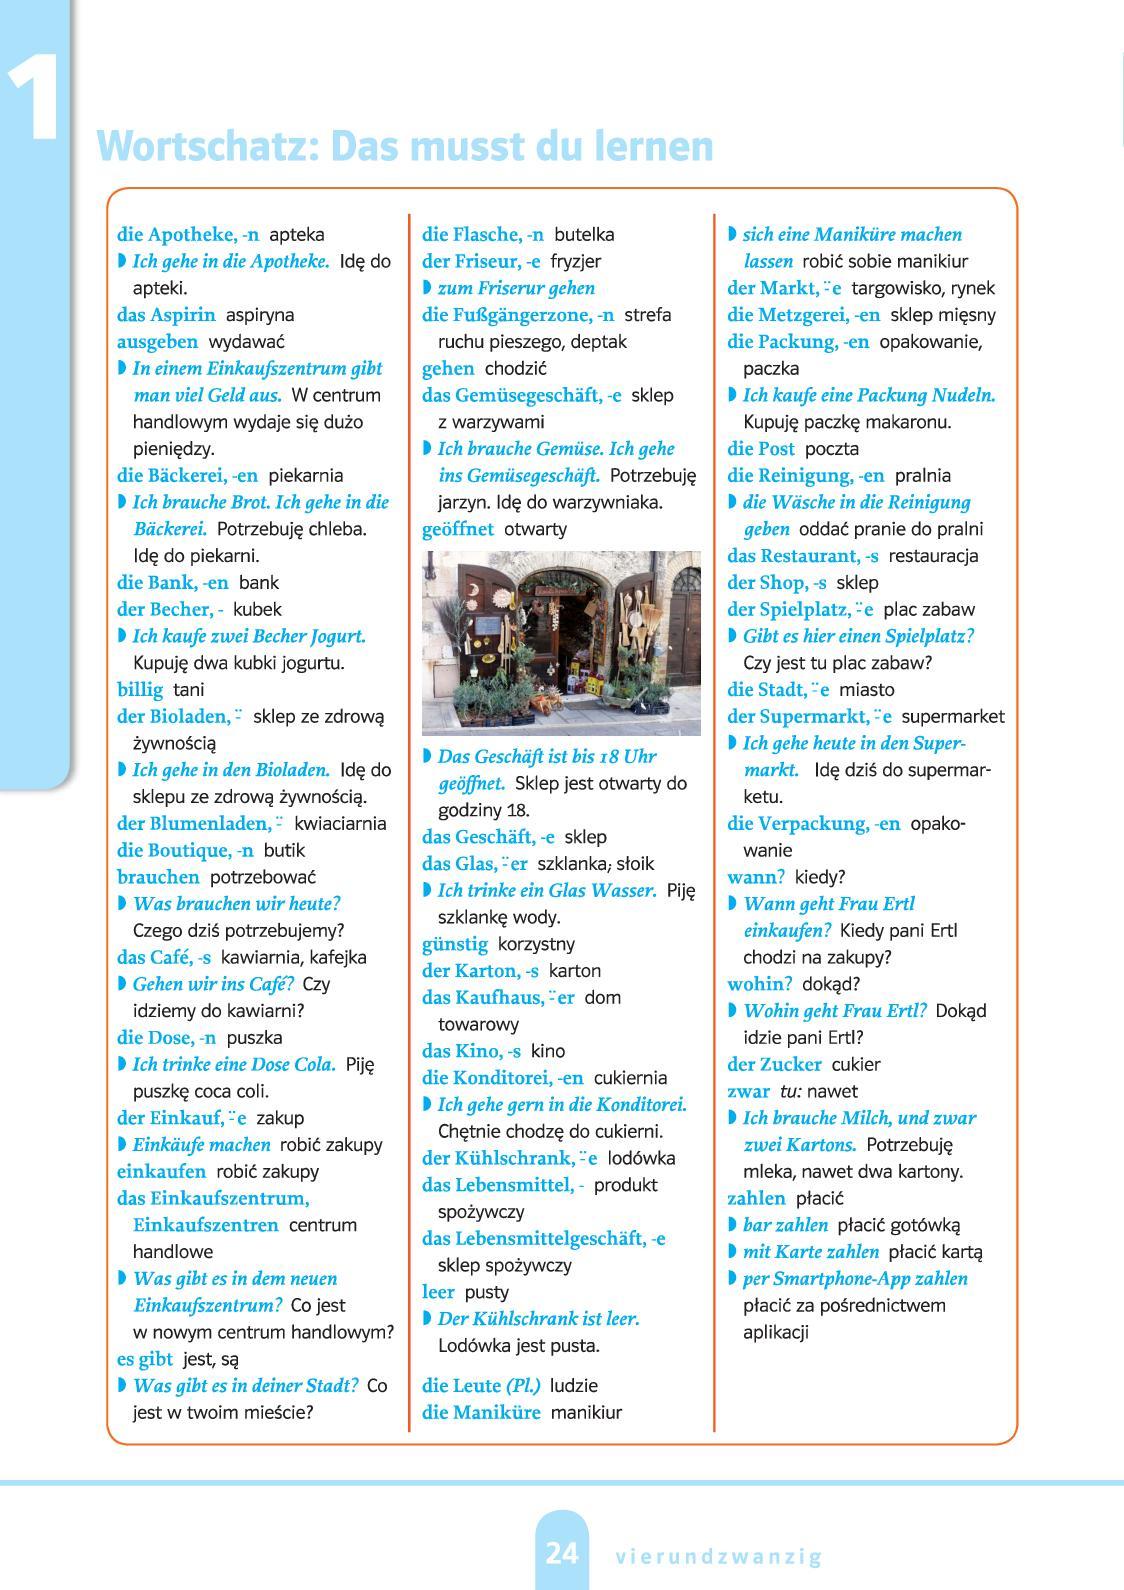 Magnet 2 npp 2017 klasa viii podrcznik calameo downloader page 26 ccuart Image collections